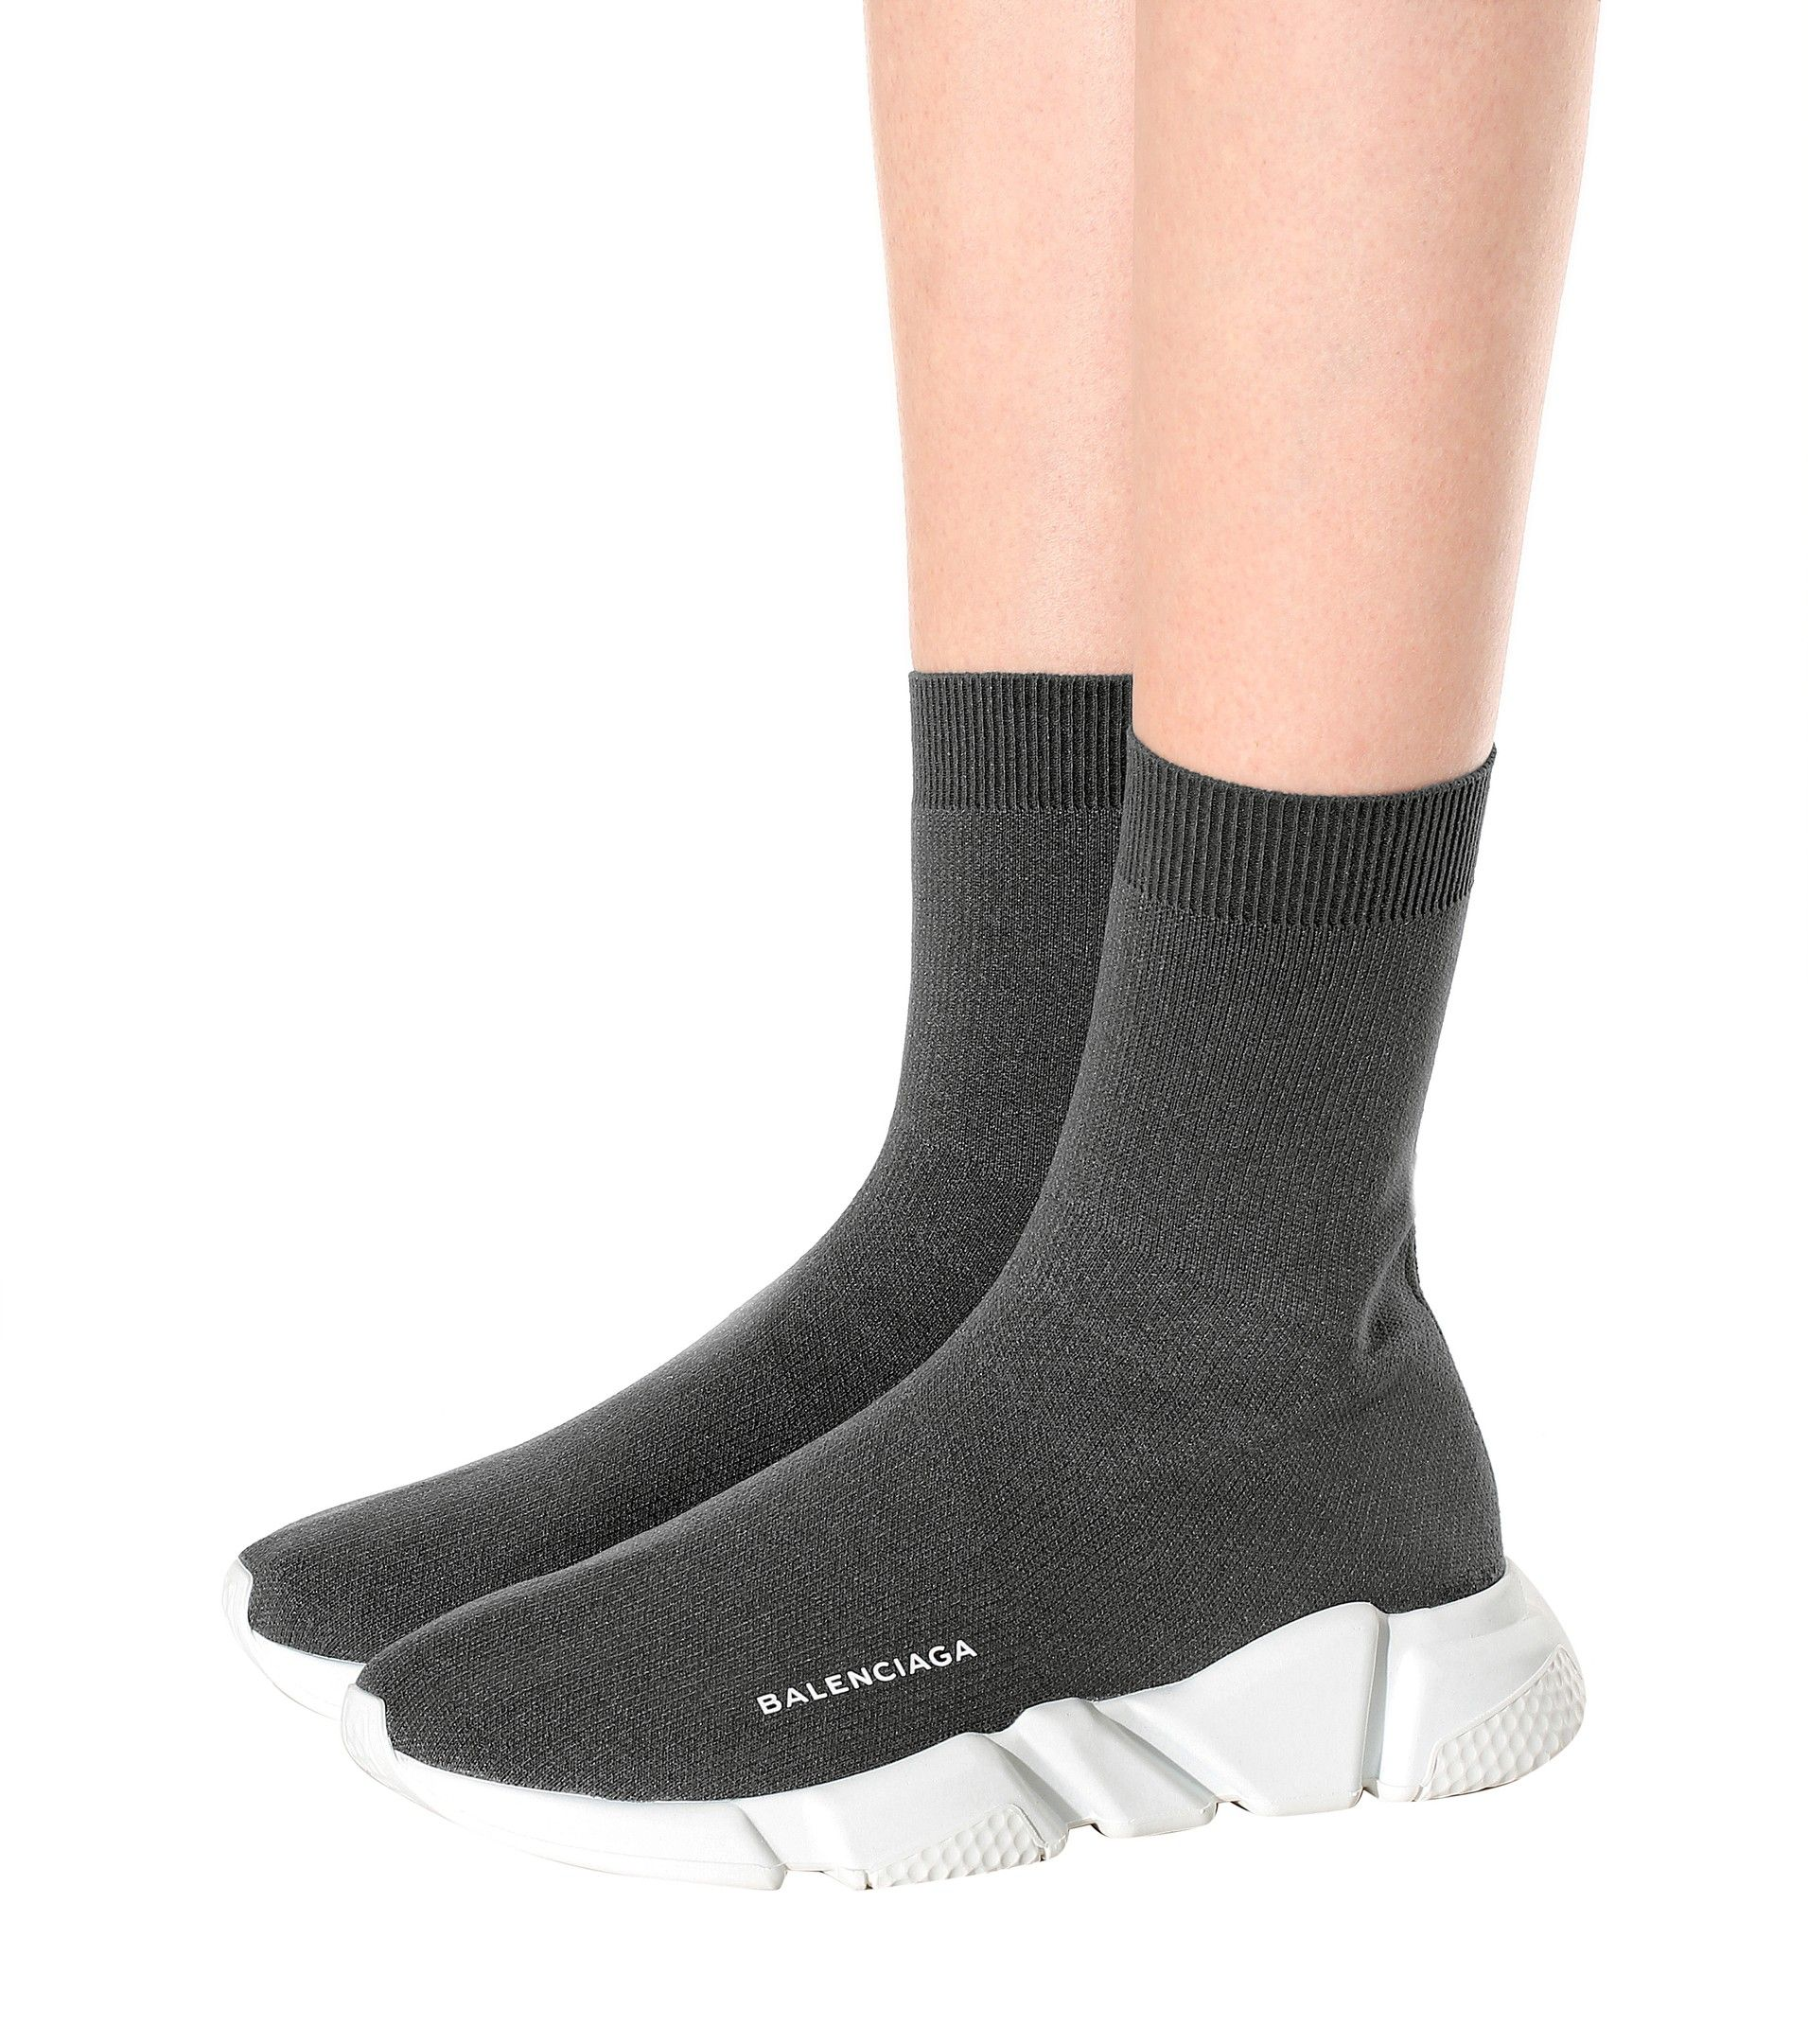 38ad4c86be6f Balenciaga Dark grey Speed Trainer sneakers